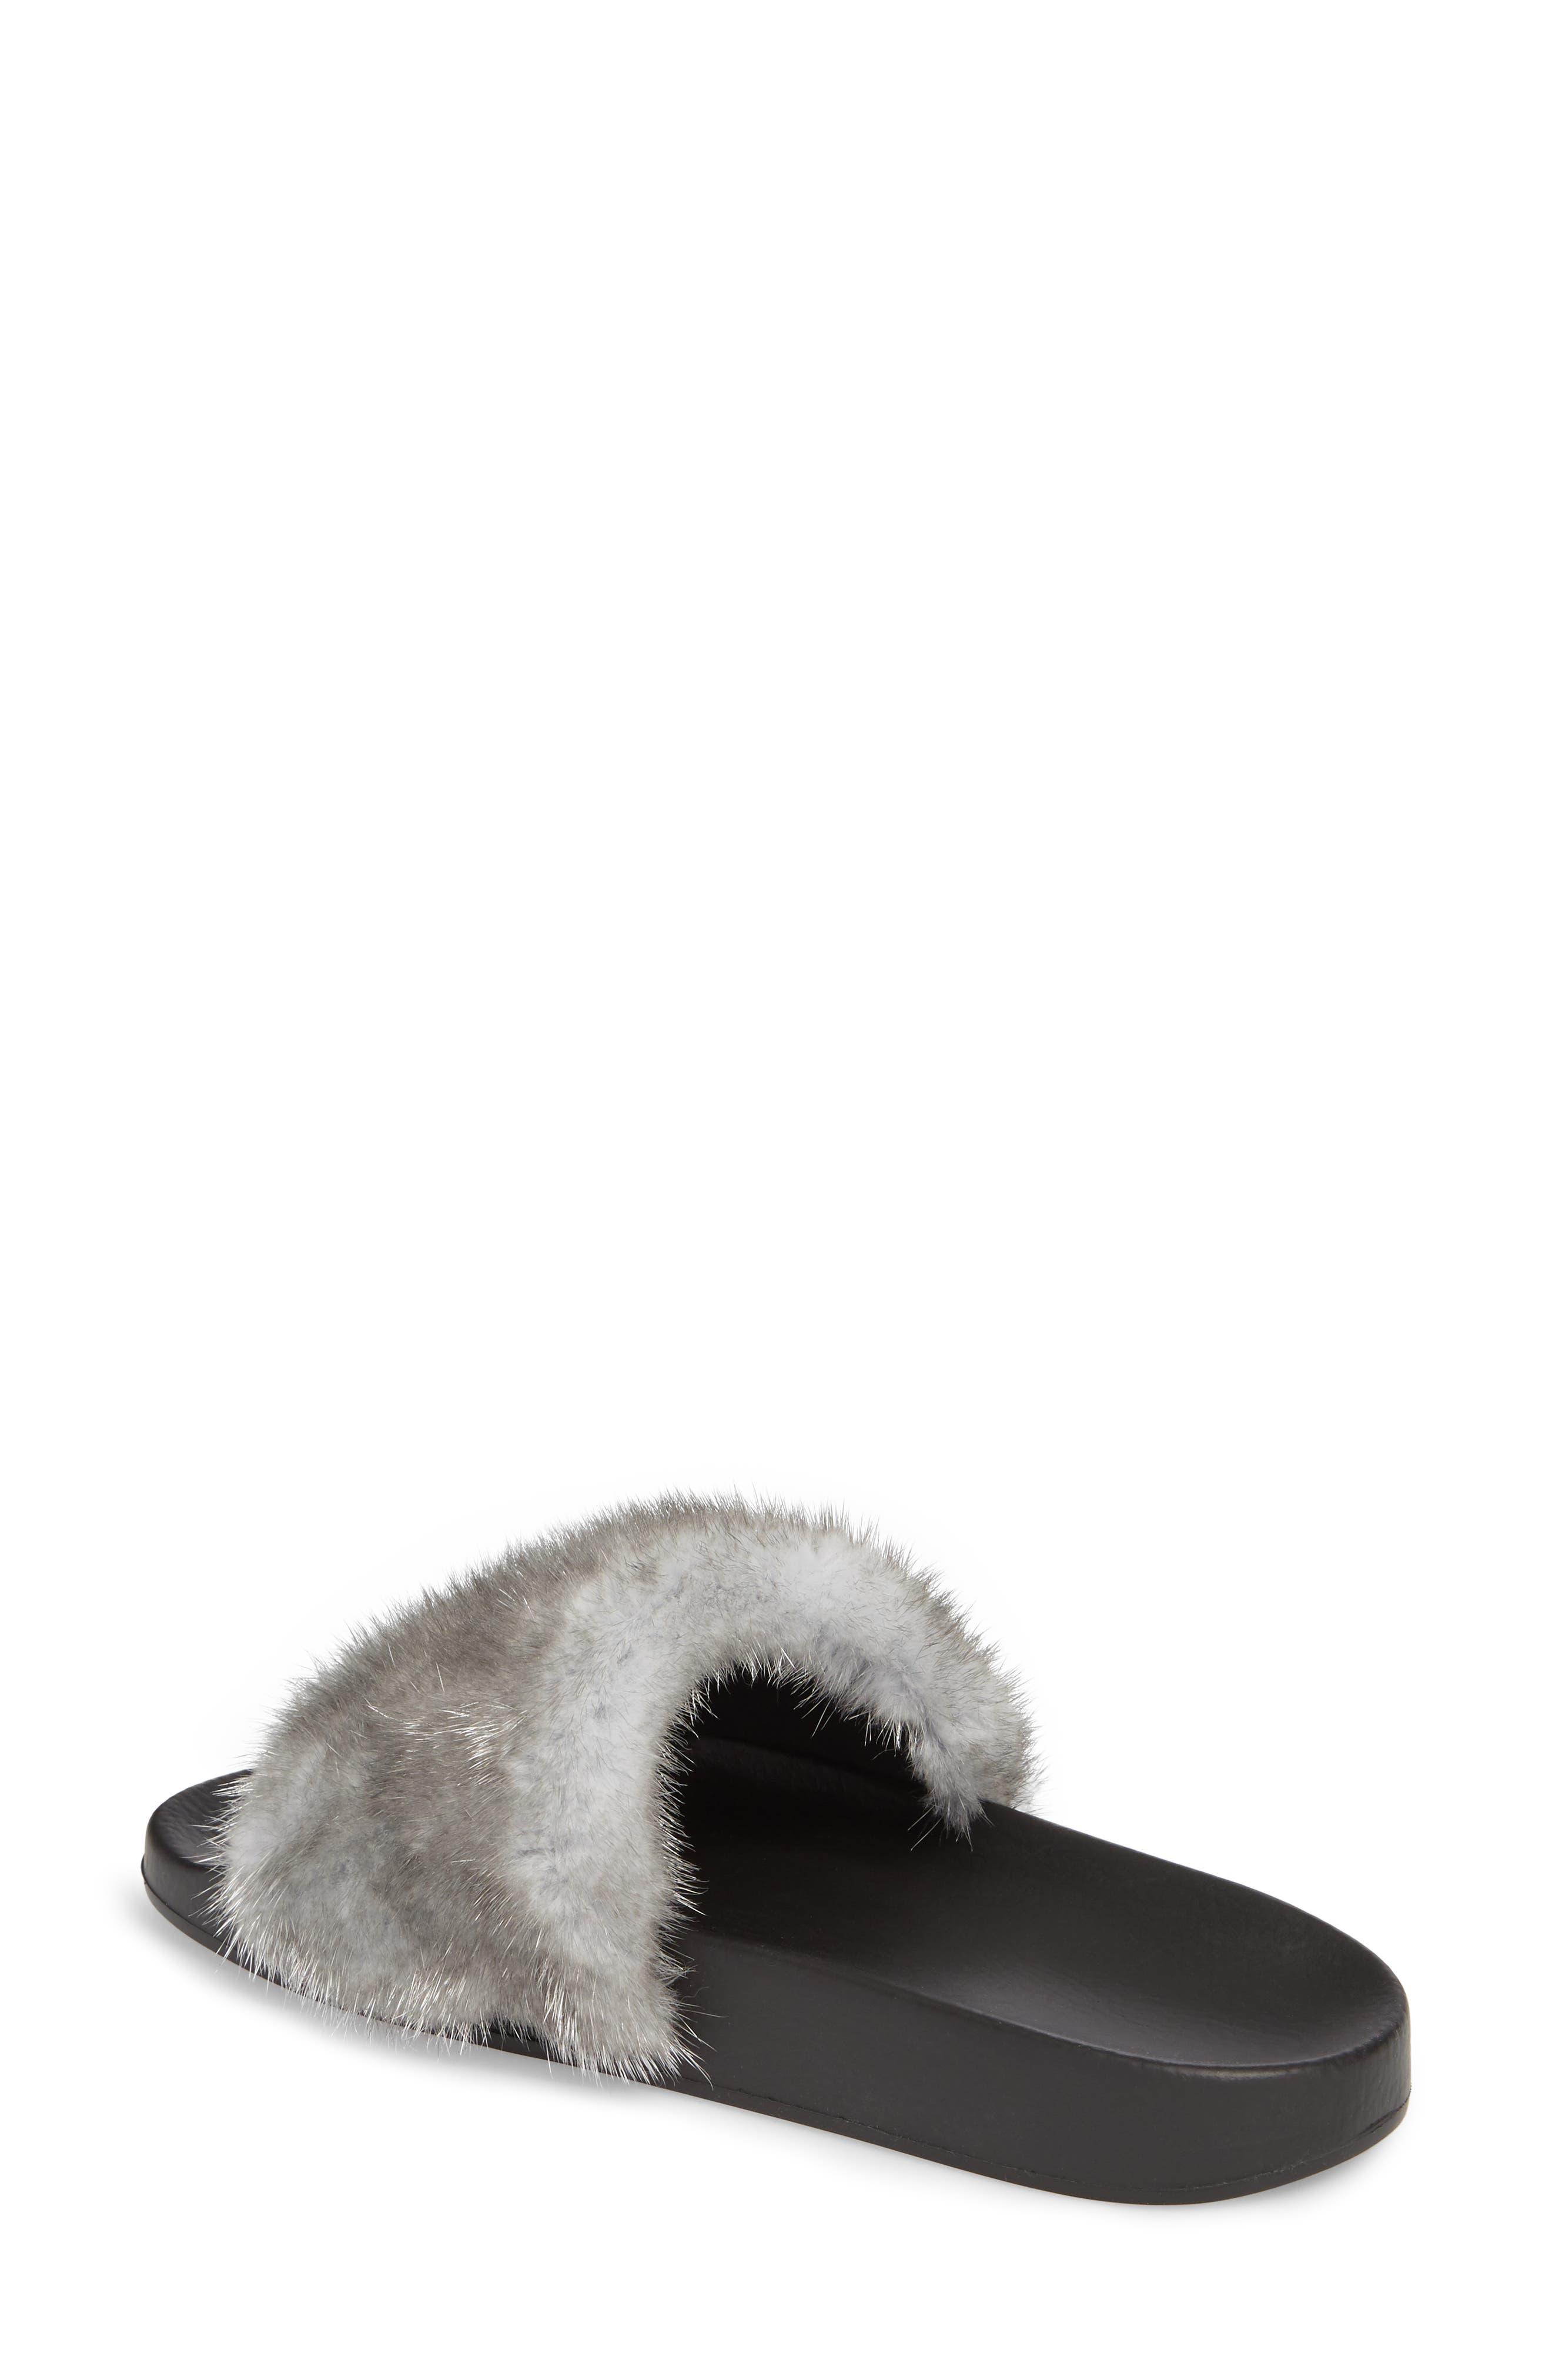 Genuine Mink Fur Slide Sandal,                             Alternate thumbnail 2, color,                             Silver